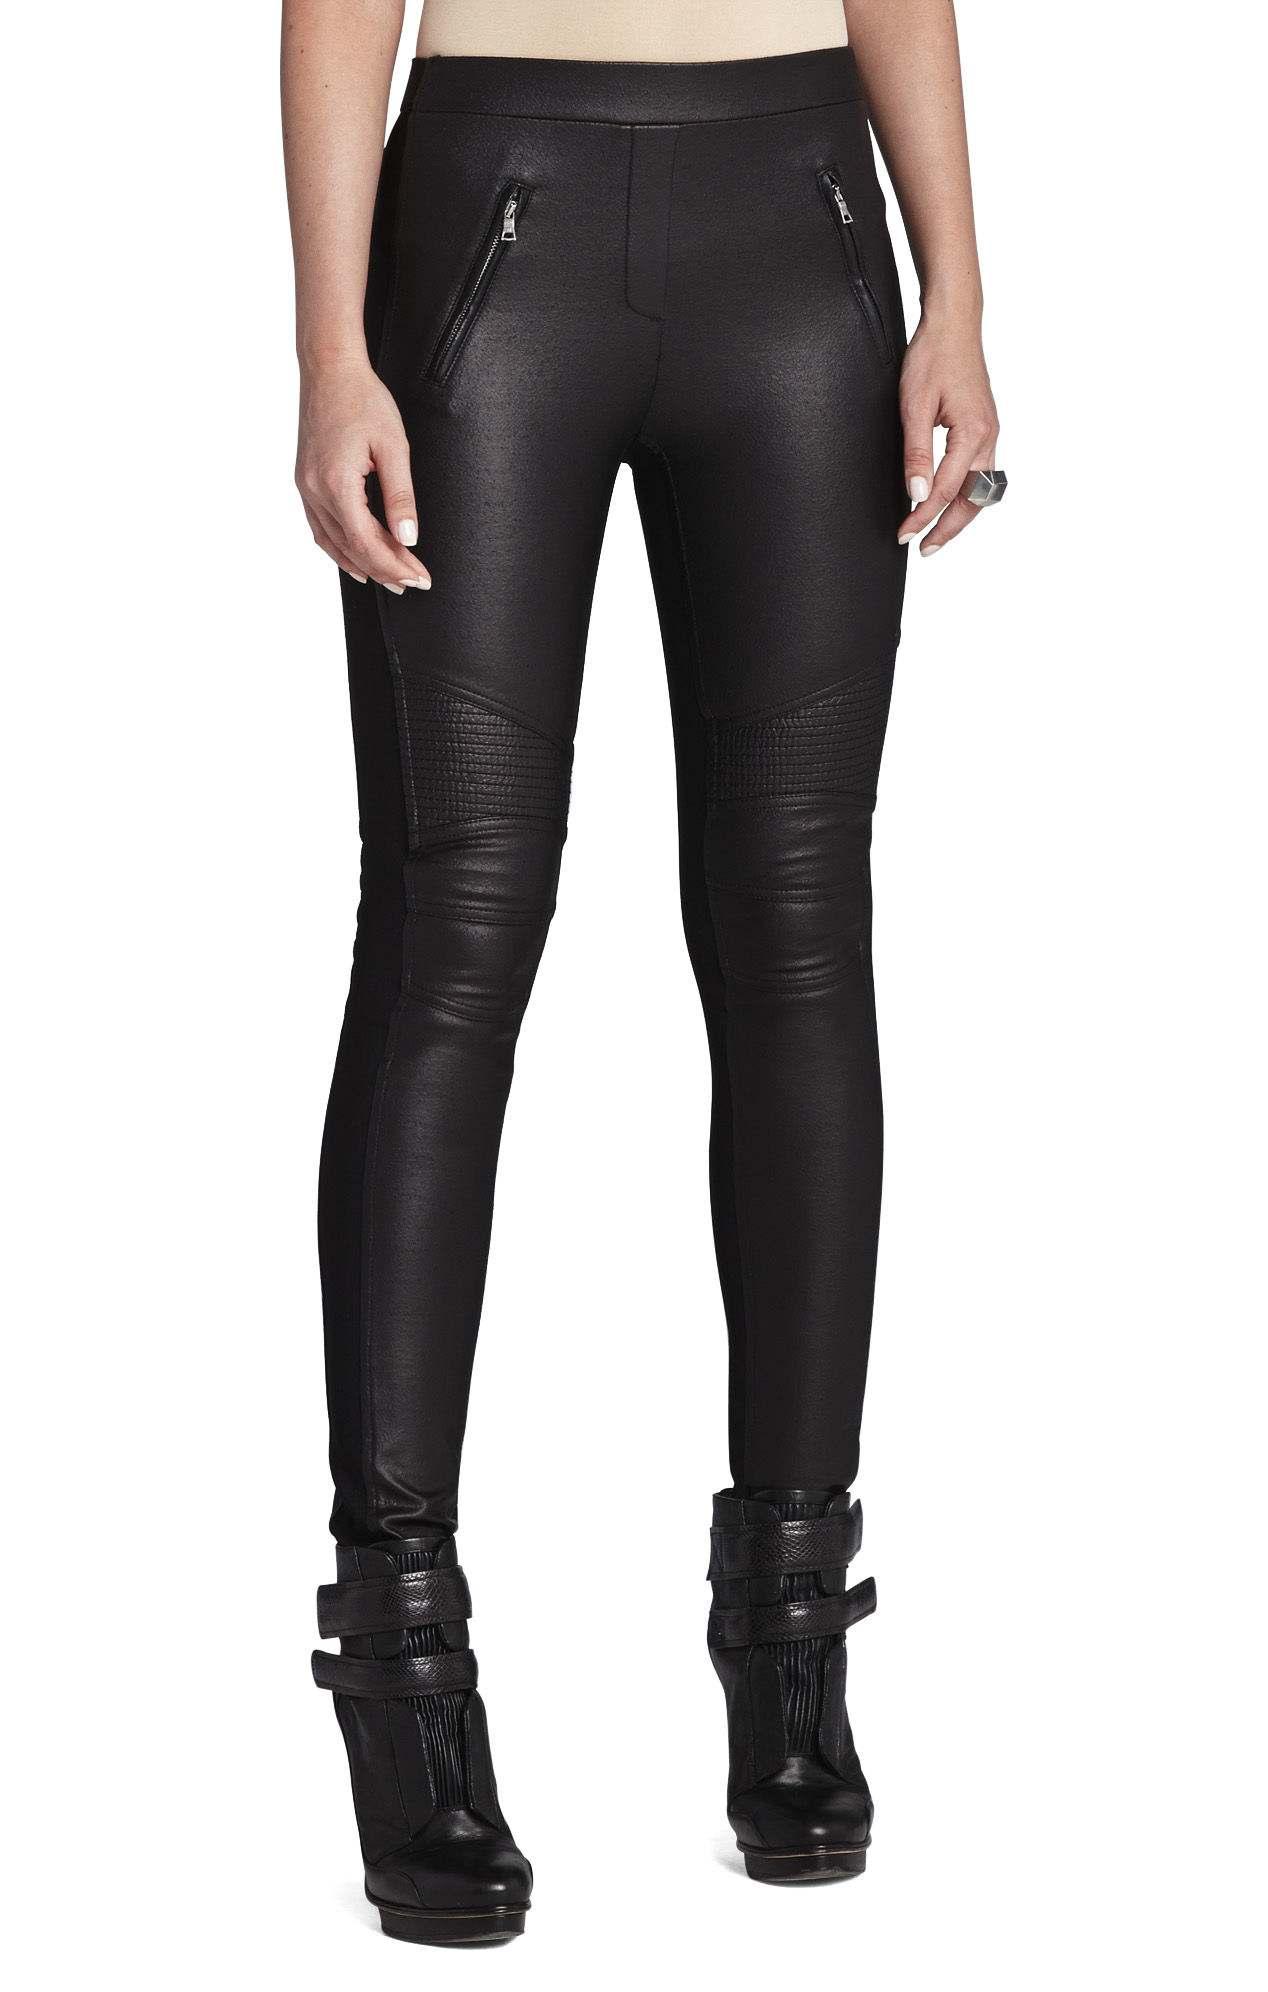 BCBG - Pantalon en cuir(158 €)